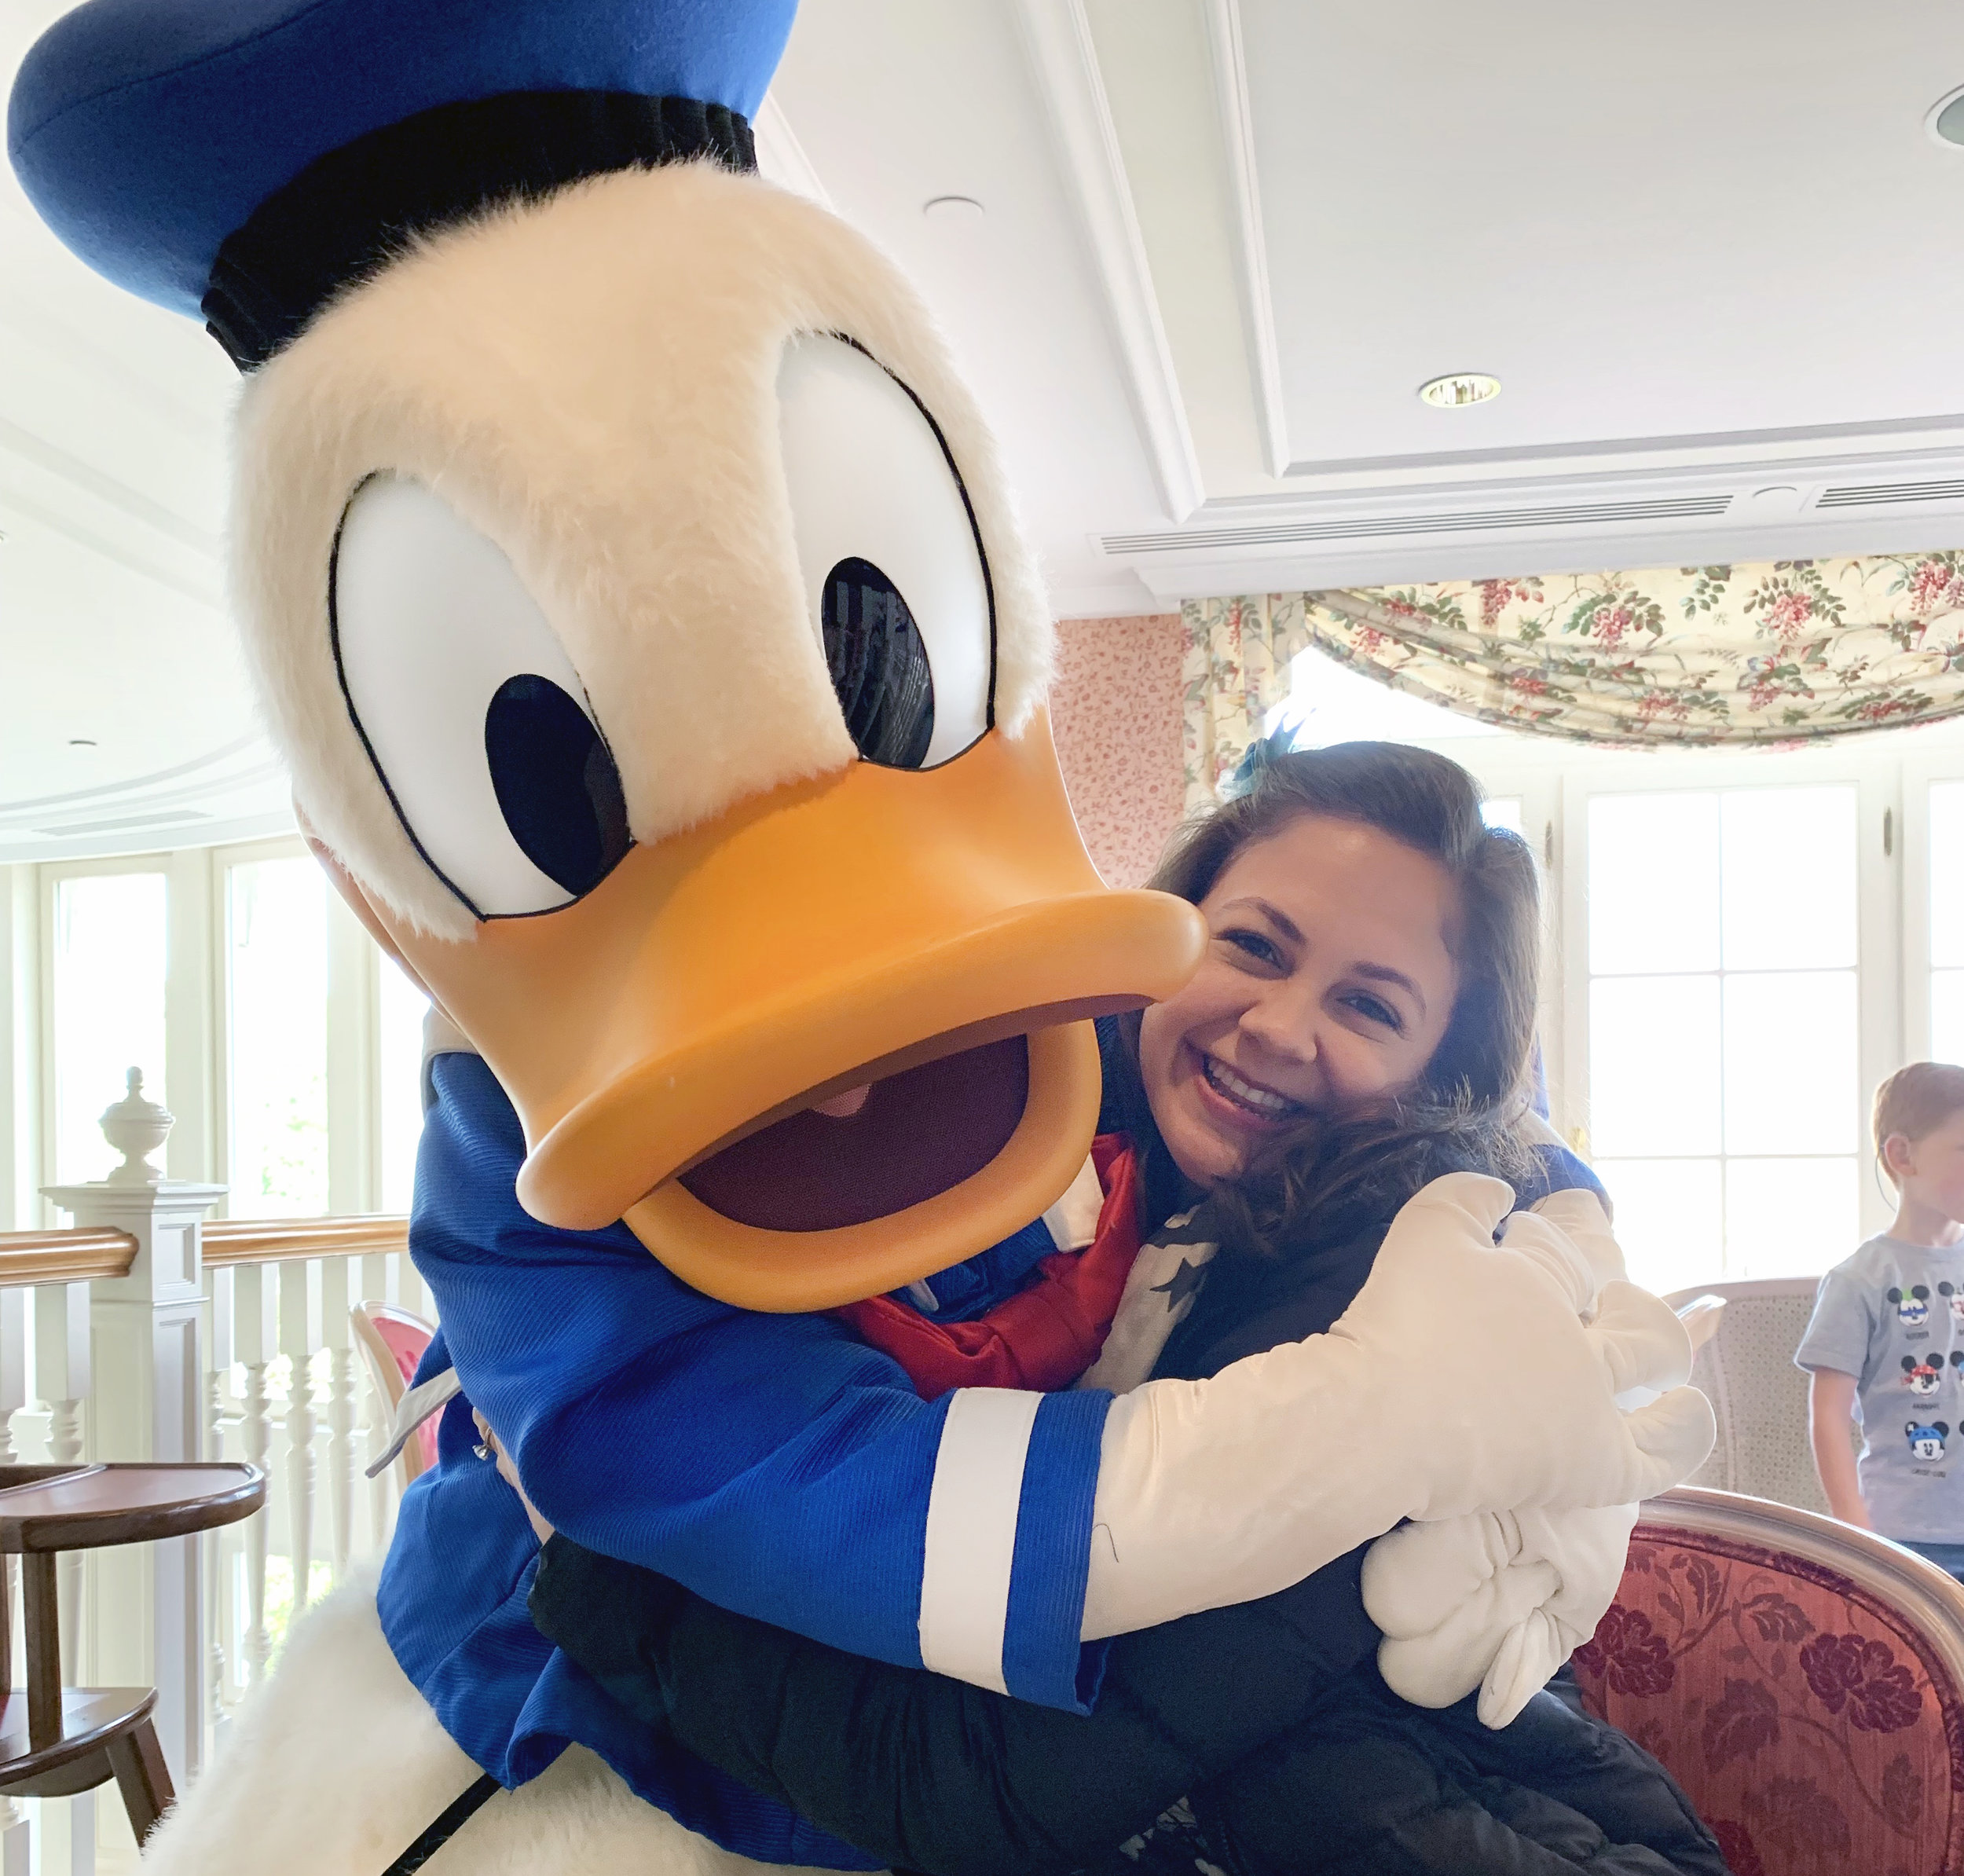 Andrea posing with Donald Duck in Disneyland Paris.